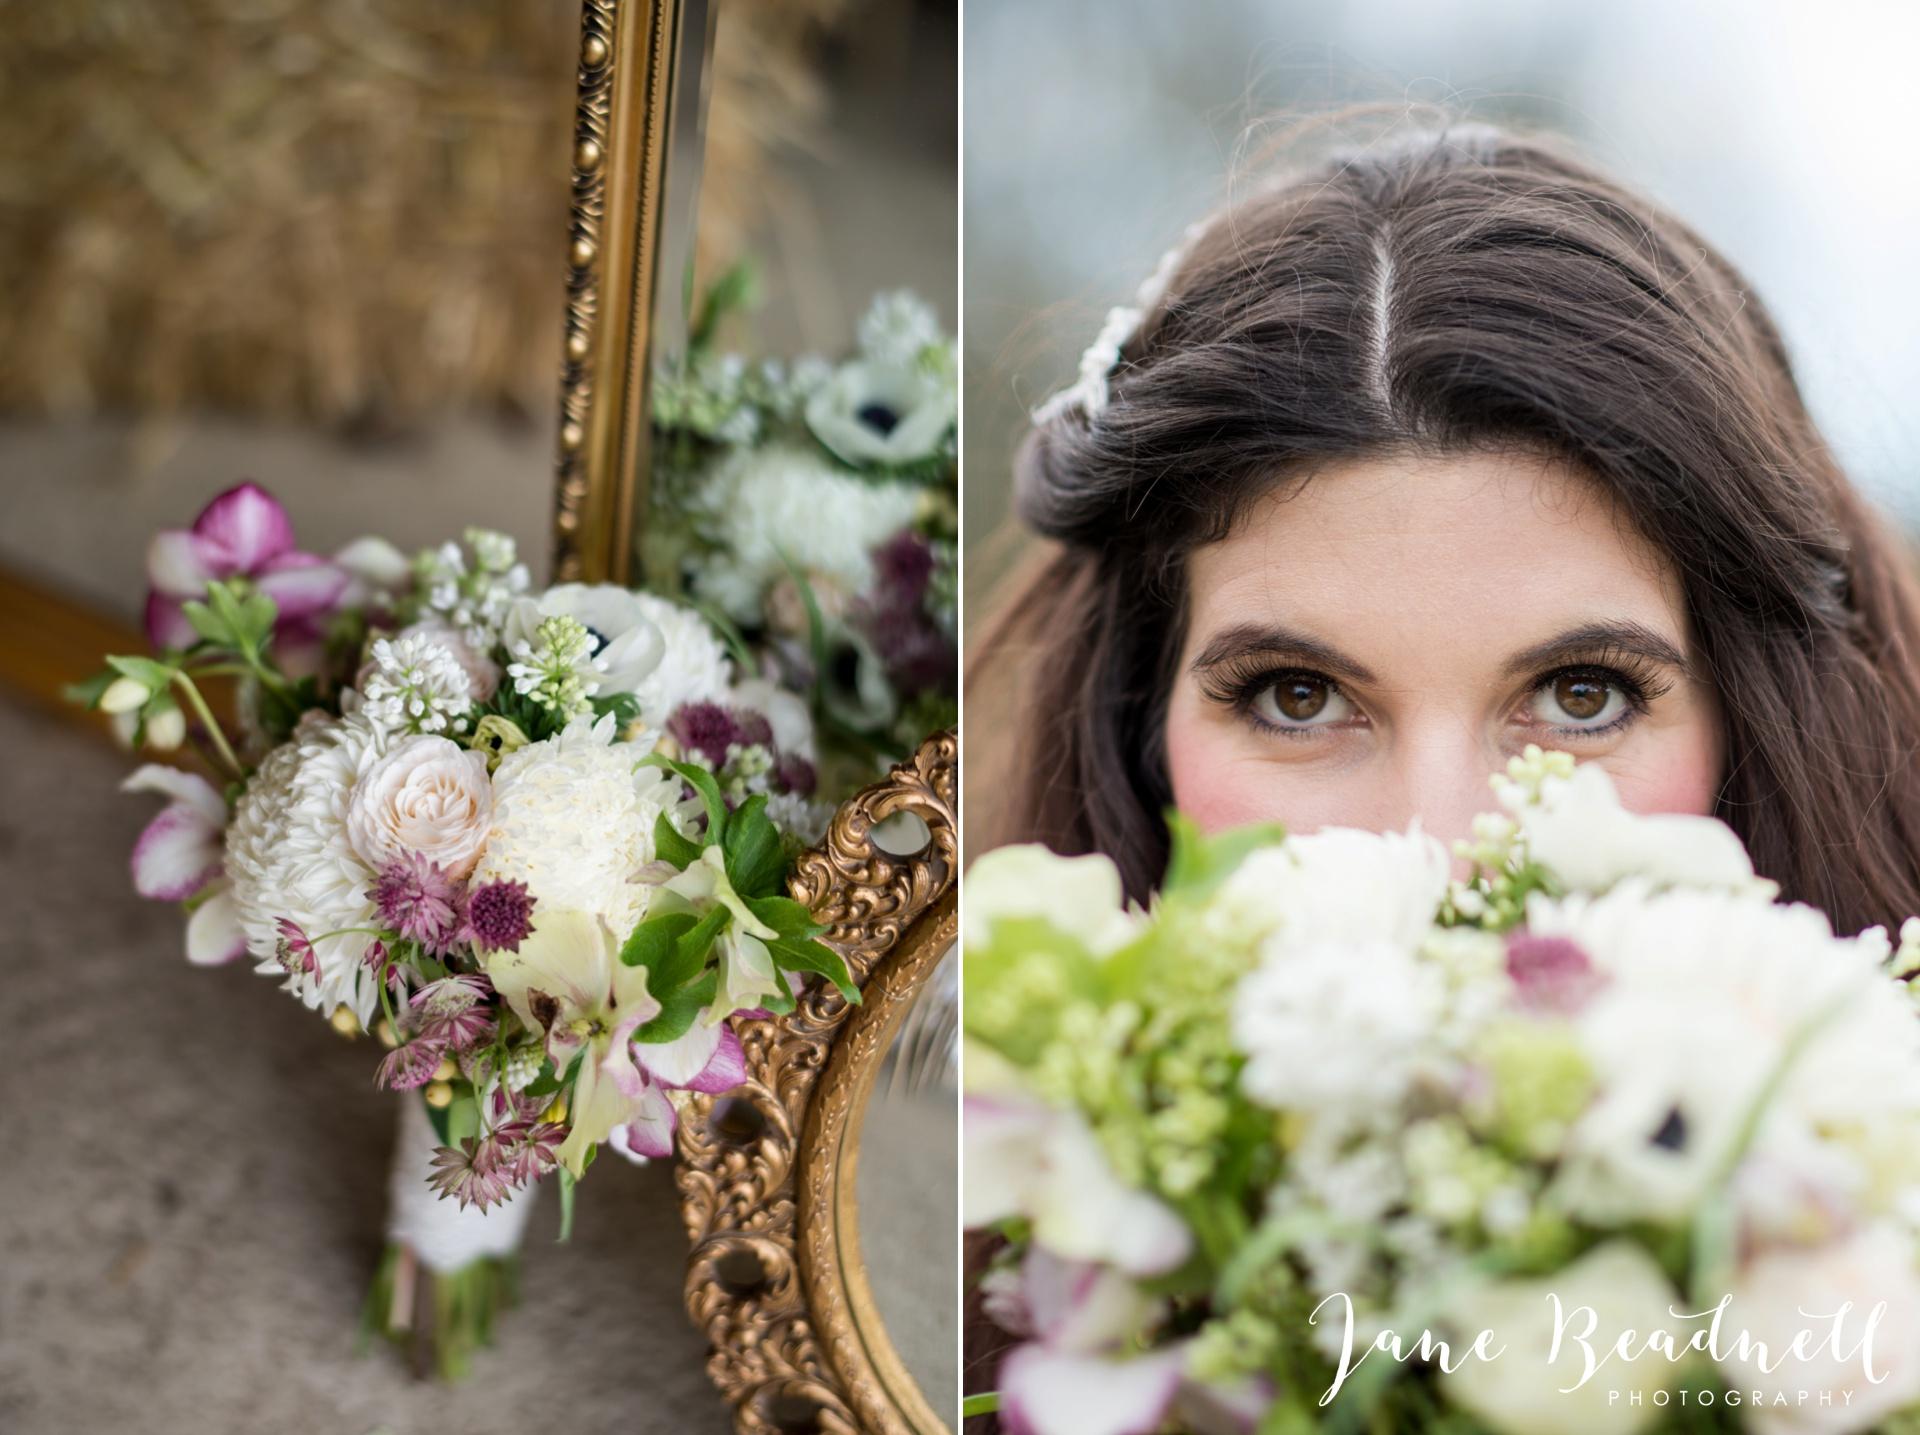 Jane Beadnell fine art wedding photographer Swinton Park10